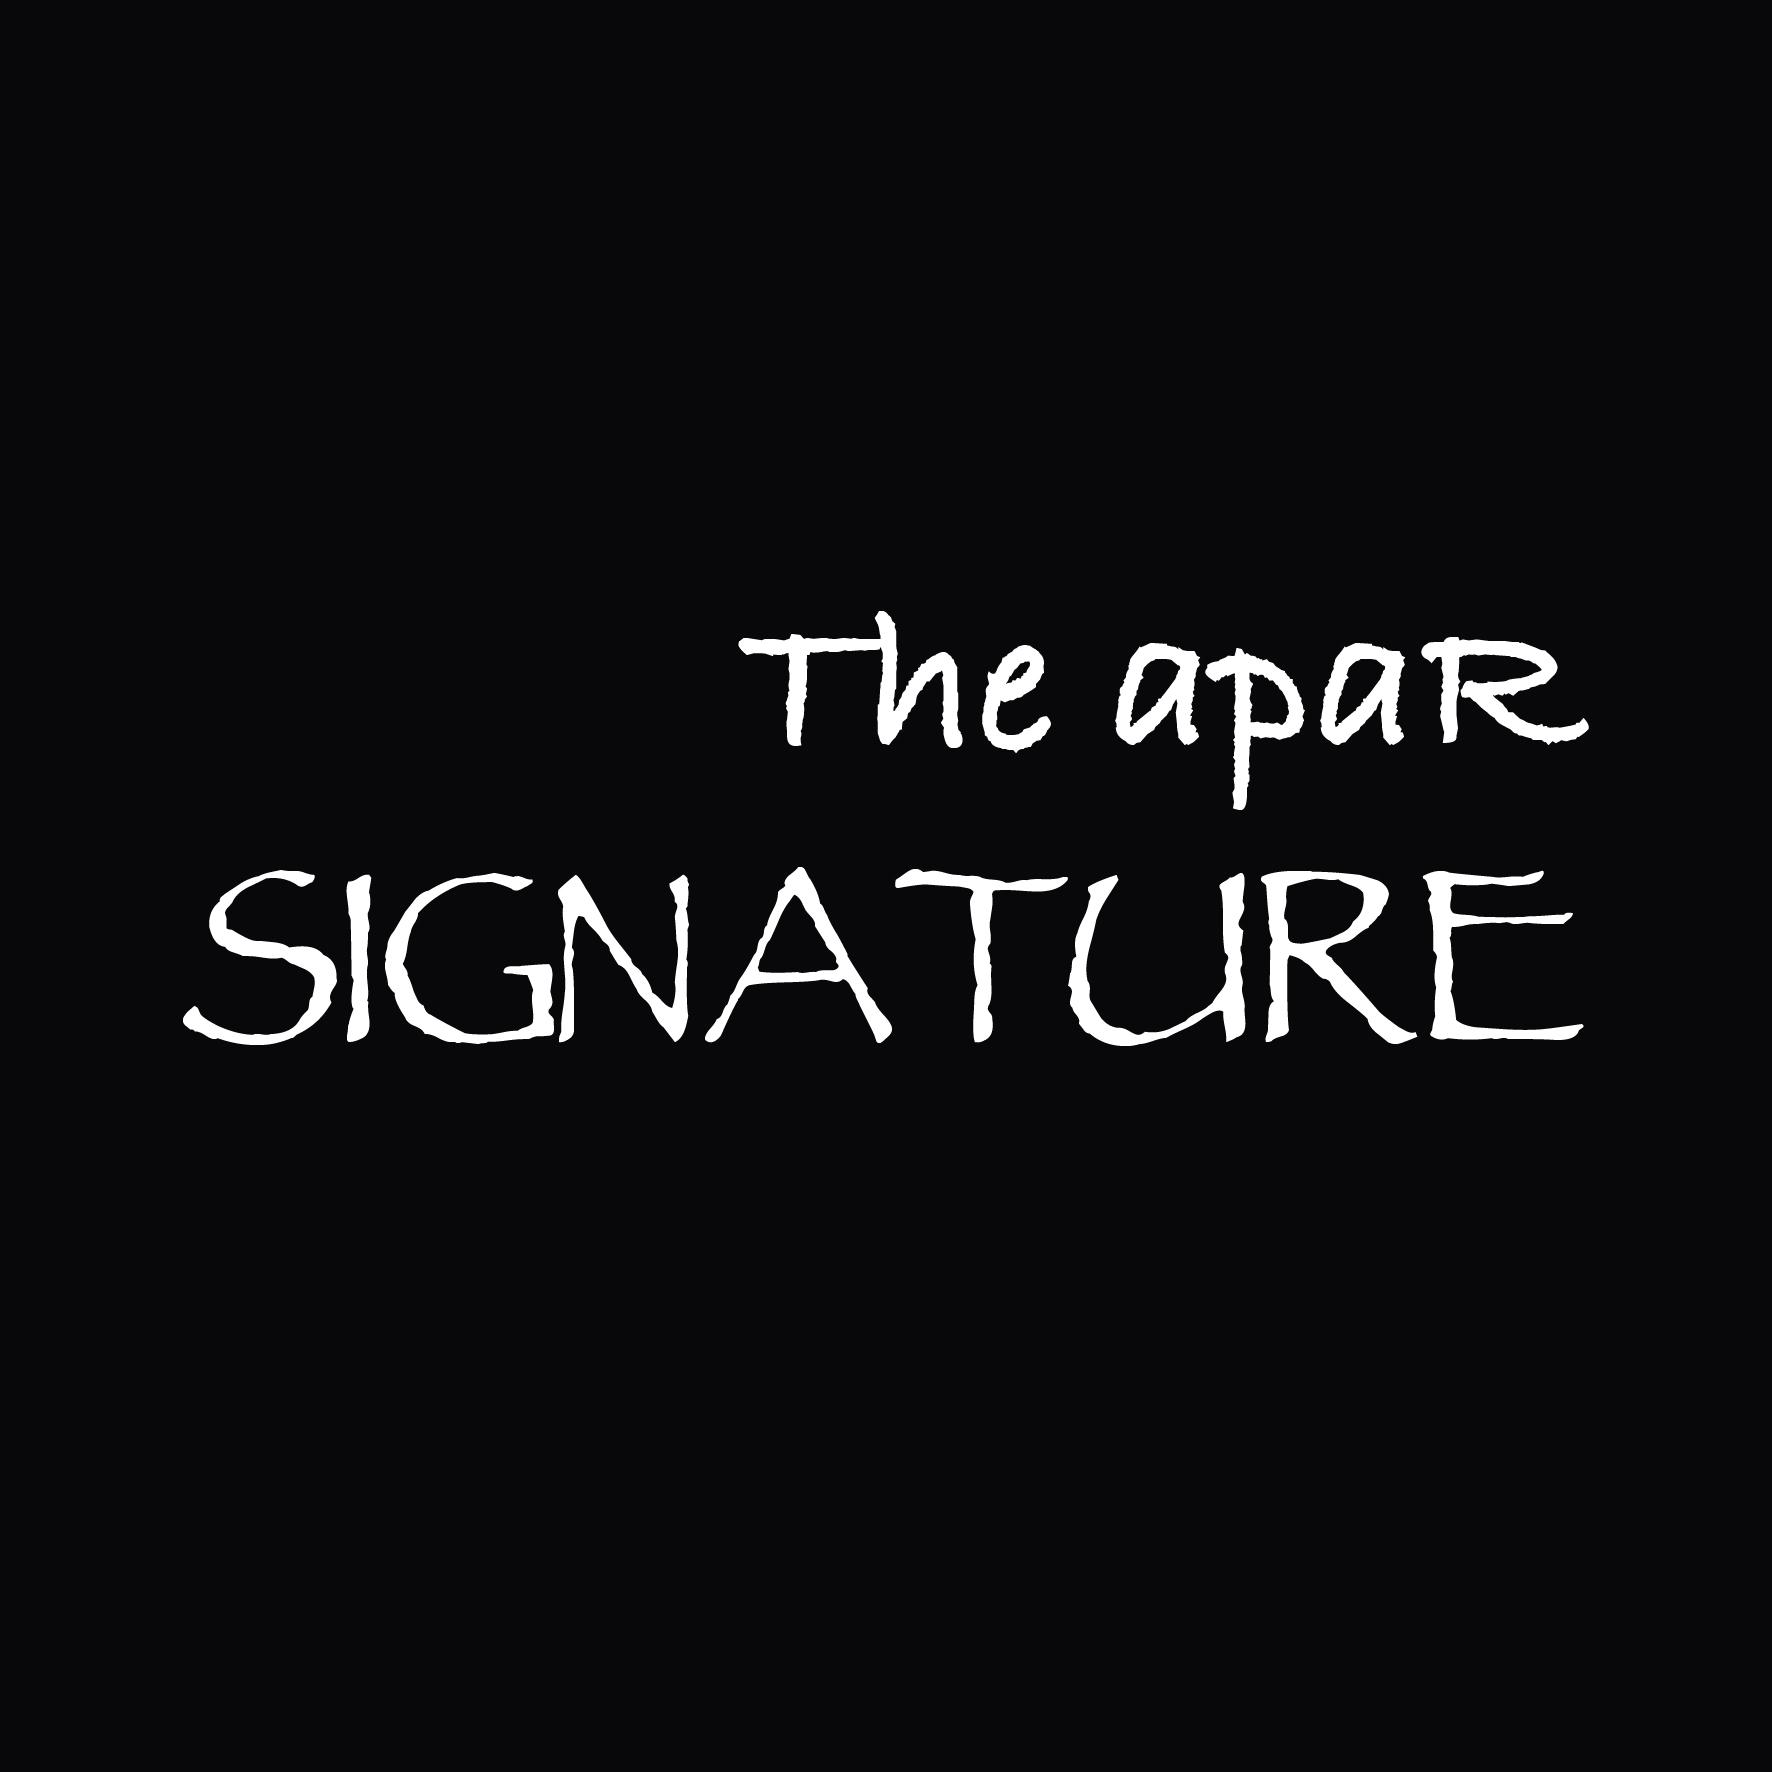 Apar title2 signature